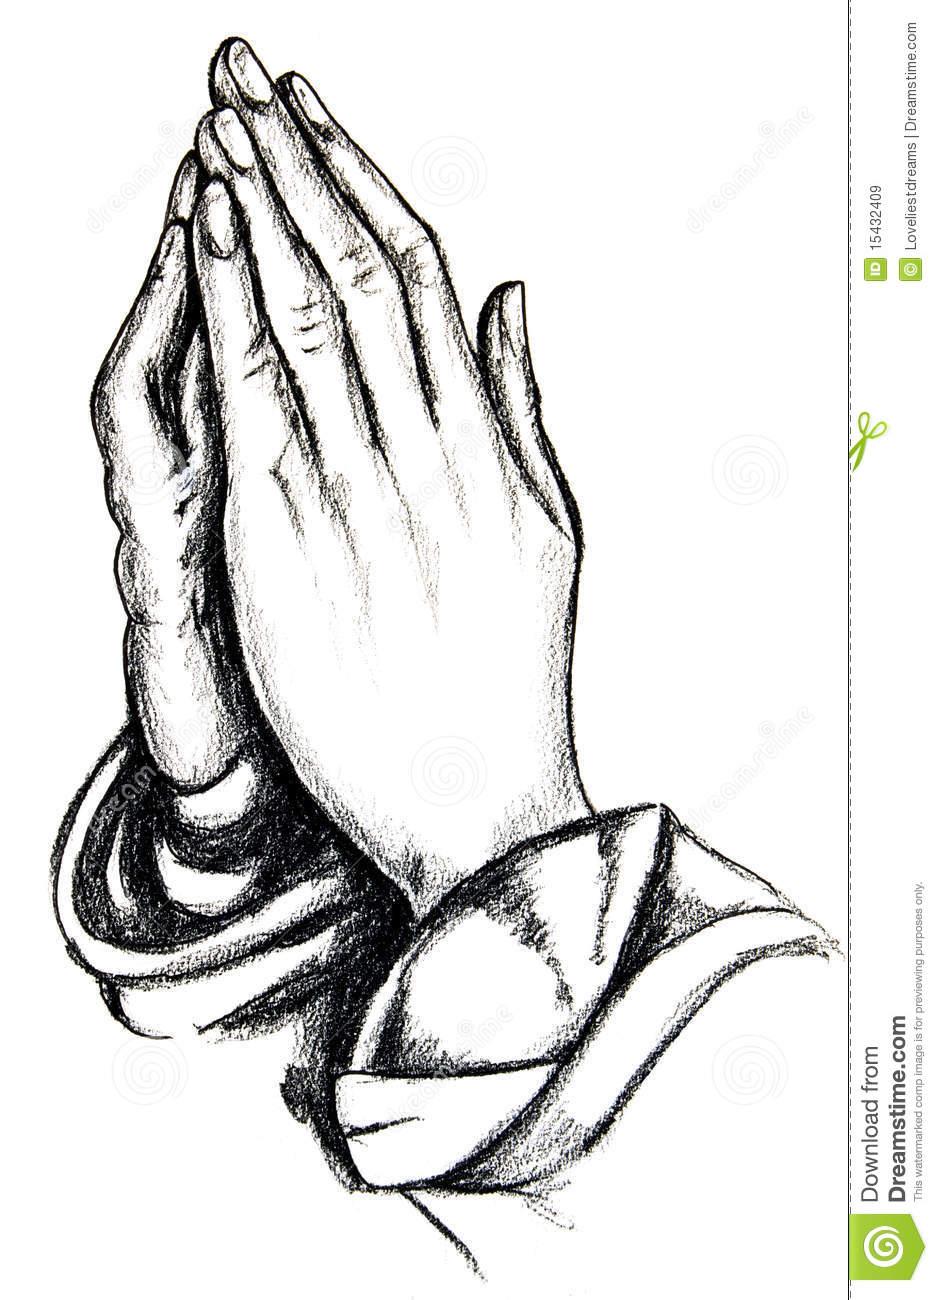 vector download Clip art download panda. Free clipart of praying hands